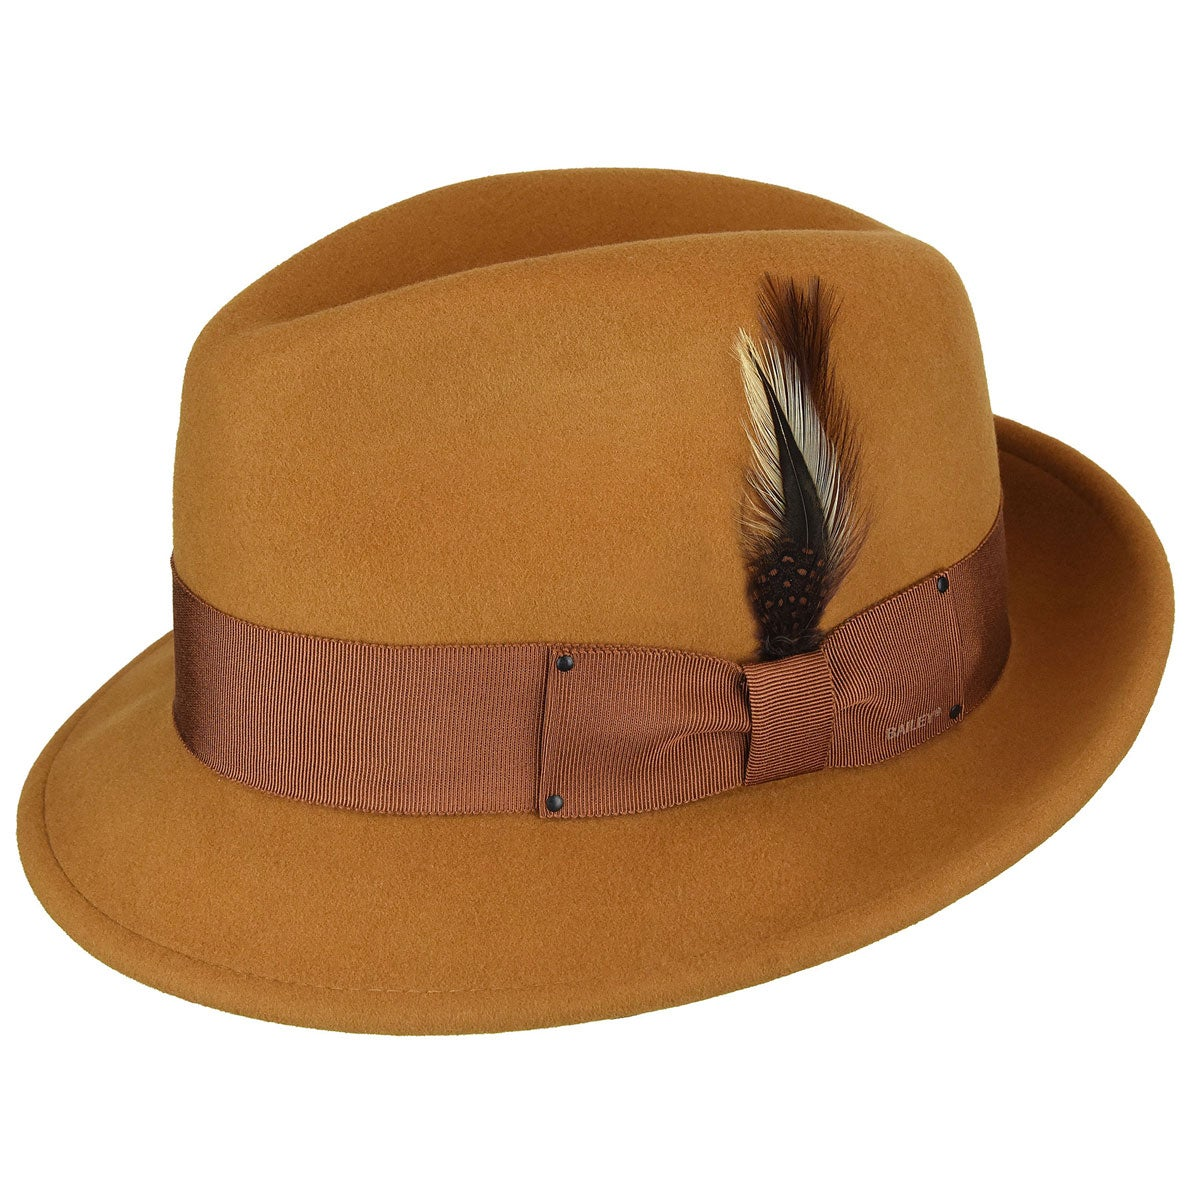 1960s – 70s Style Men's Hats Tino LiteFeltFedora $71.25 AT vintagedancer.com